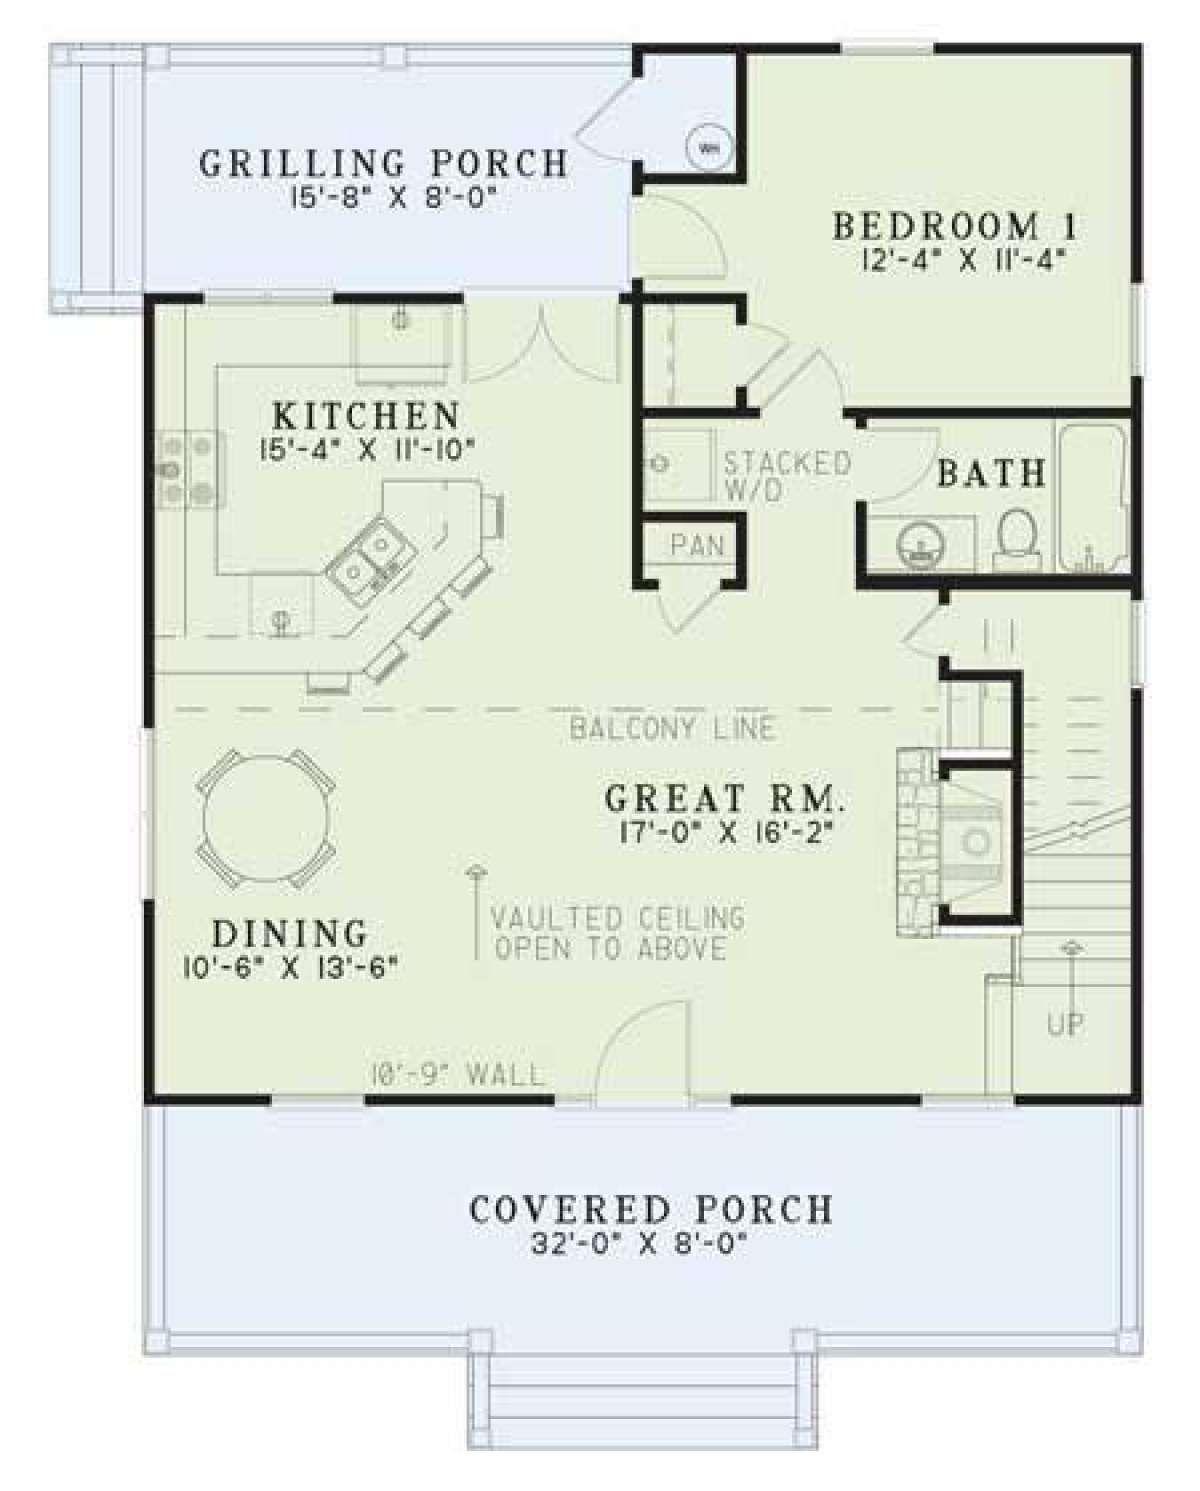 House Plan 11000311 Cottage Plan 1,400 Square Feet, 2